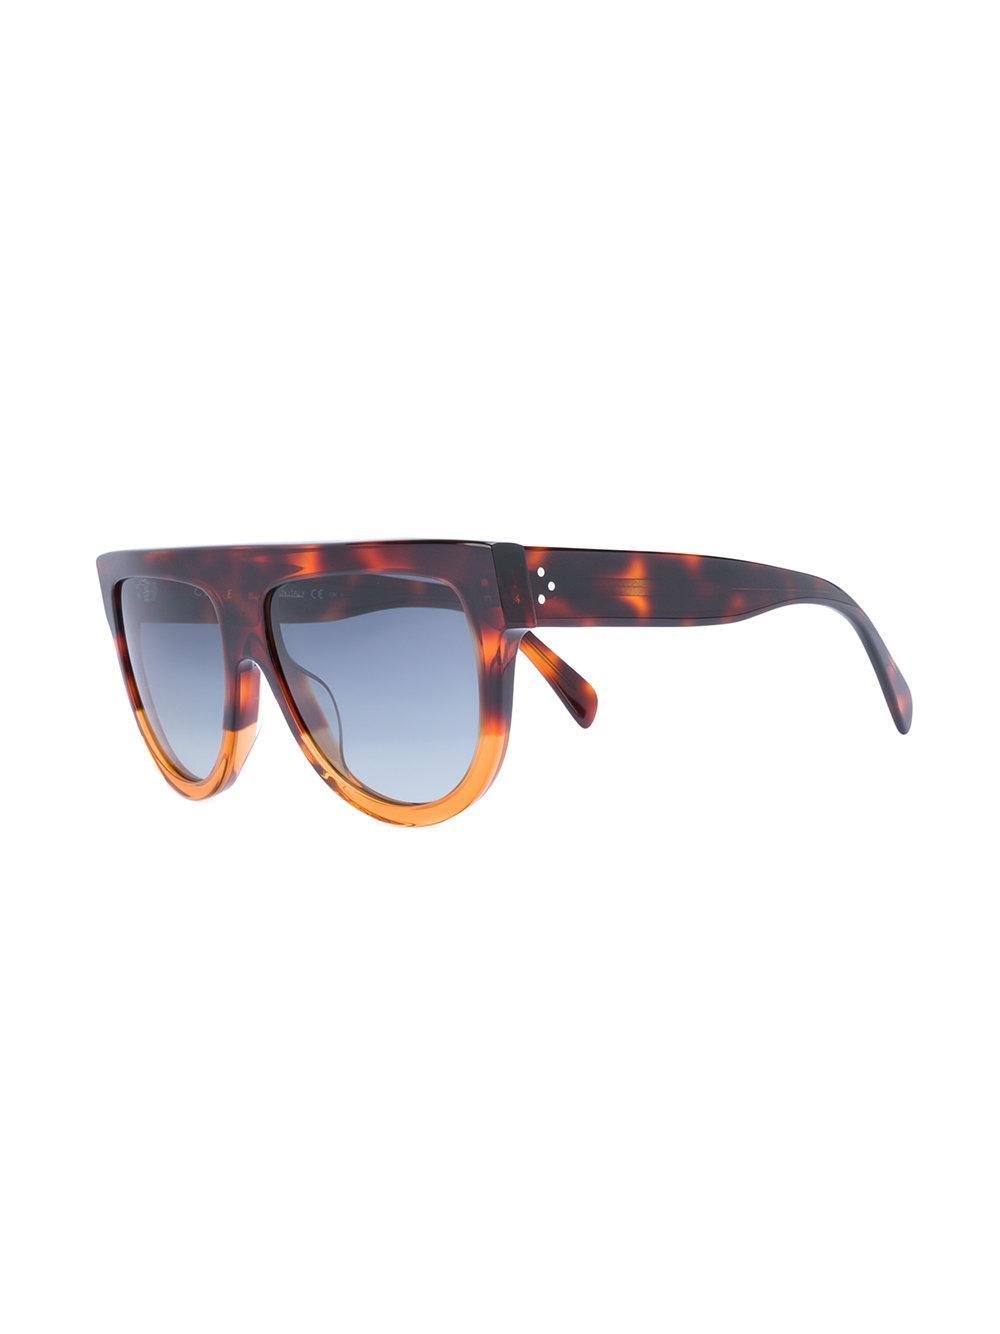 500c23e31d40 Céline D-frame Sunglasses in Brown - Lyst